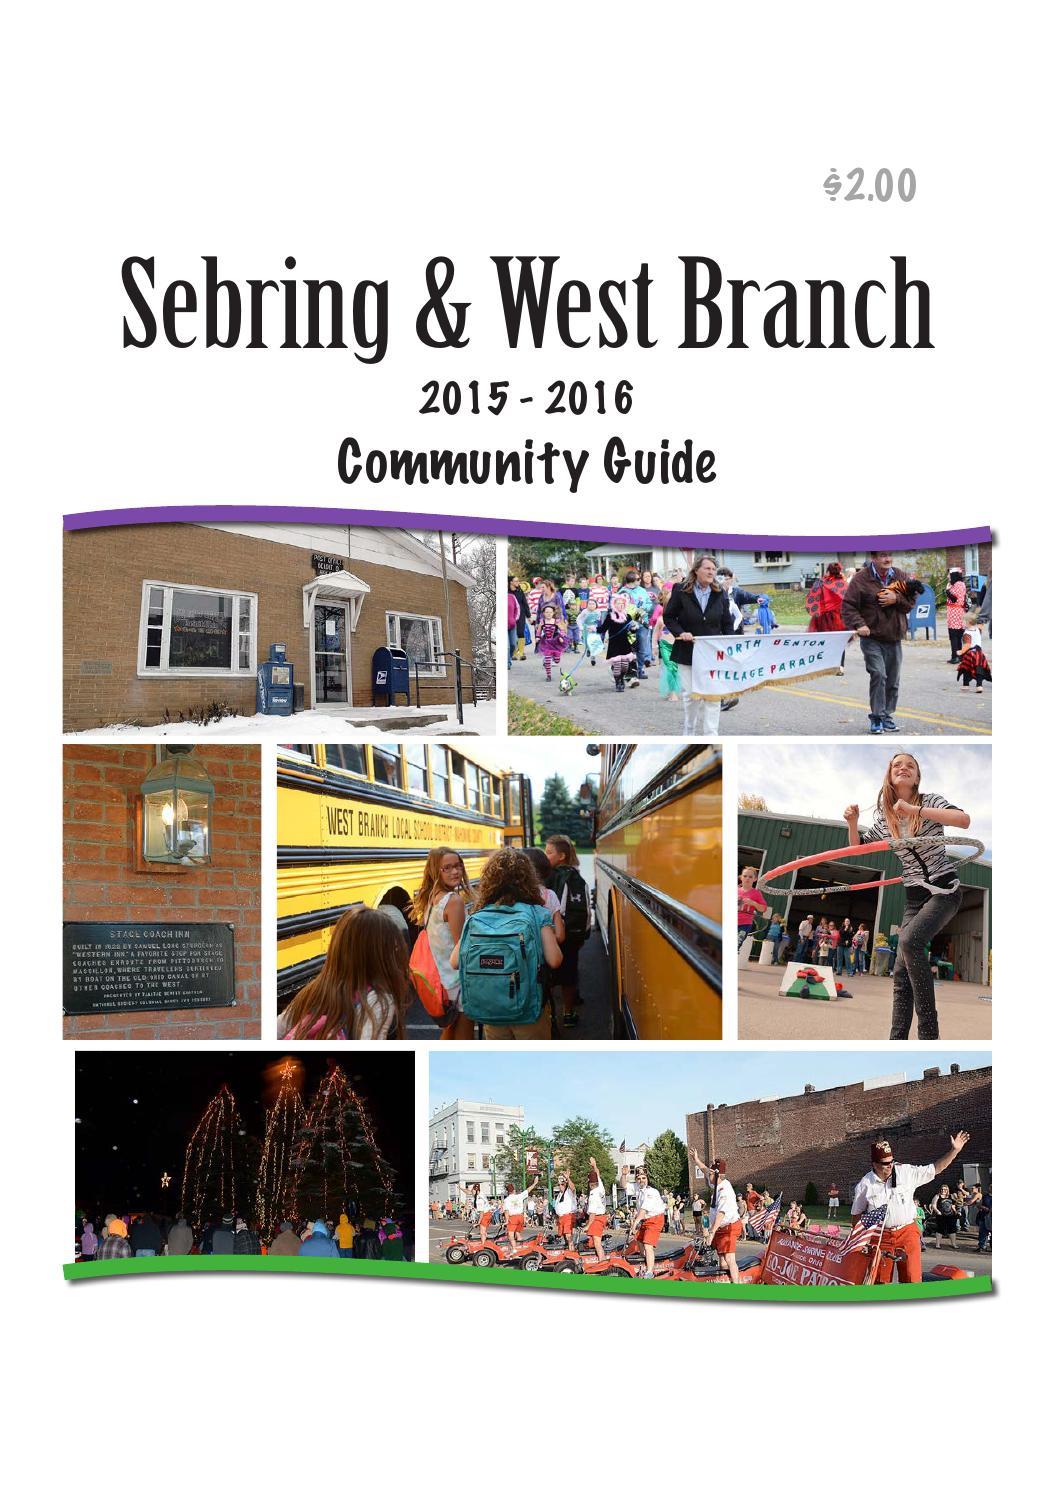 sebring west branch 2015 2016 community guide by gannett neo issuu sebring west branch 2015 2016